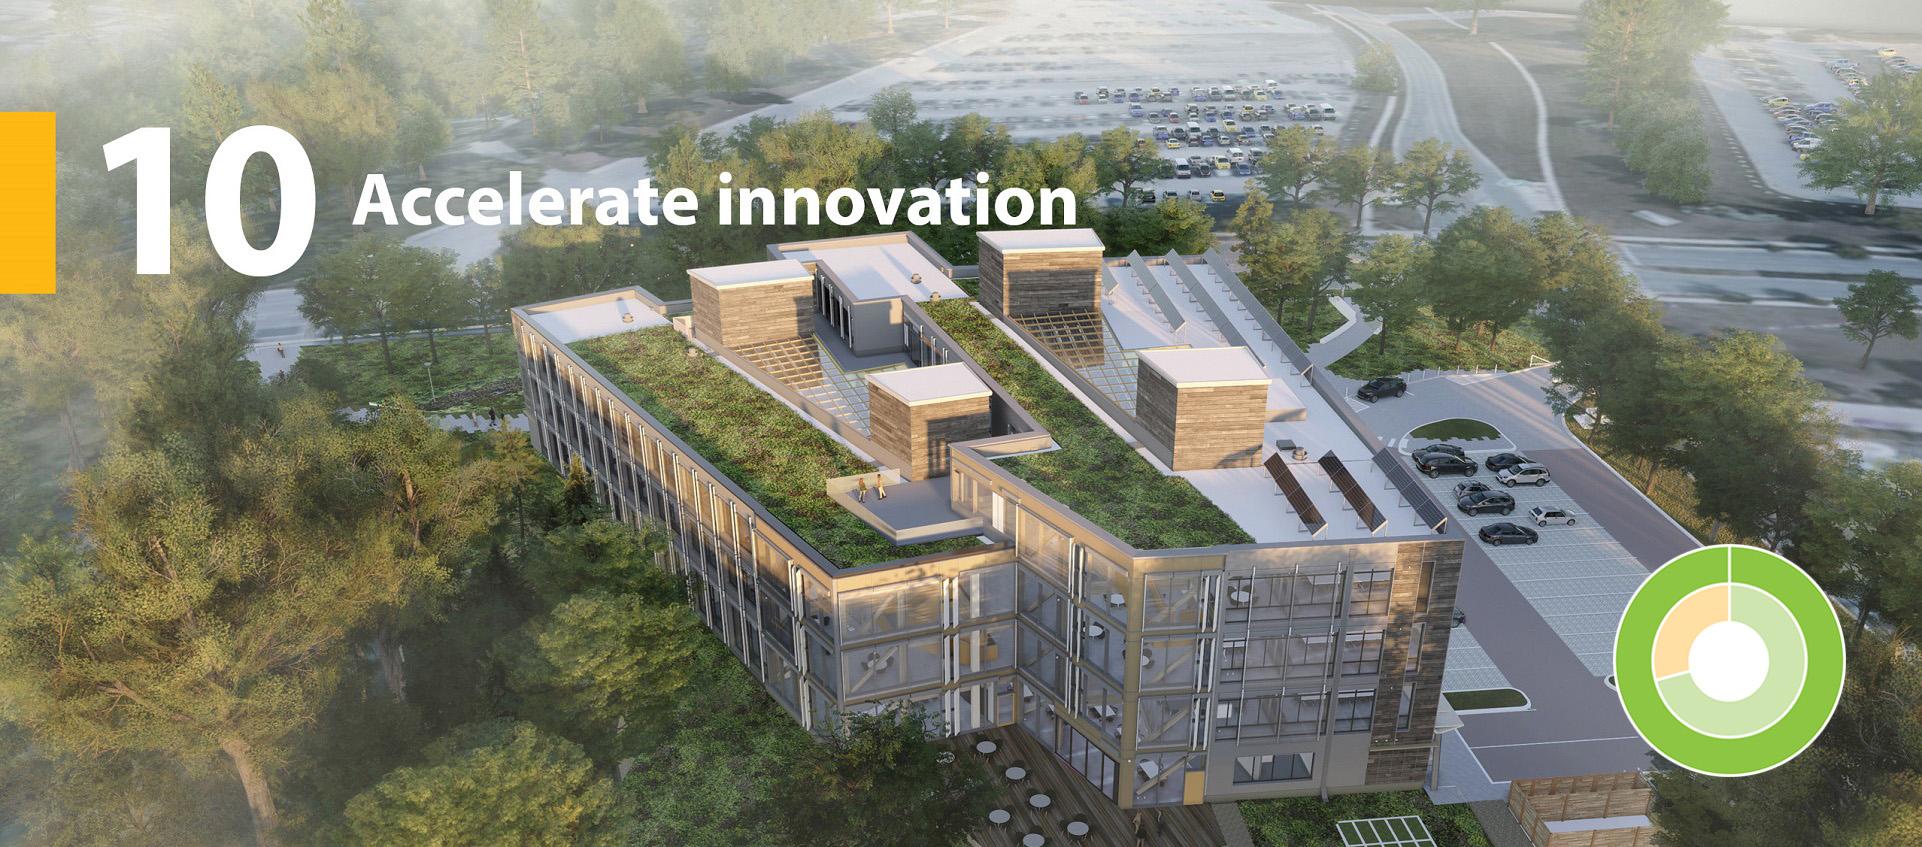 TRCA Strategic Goal 10 - Accelerate Innovation